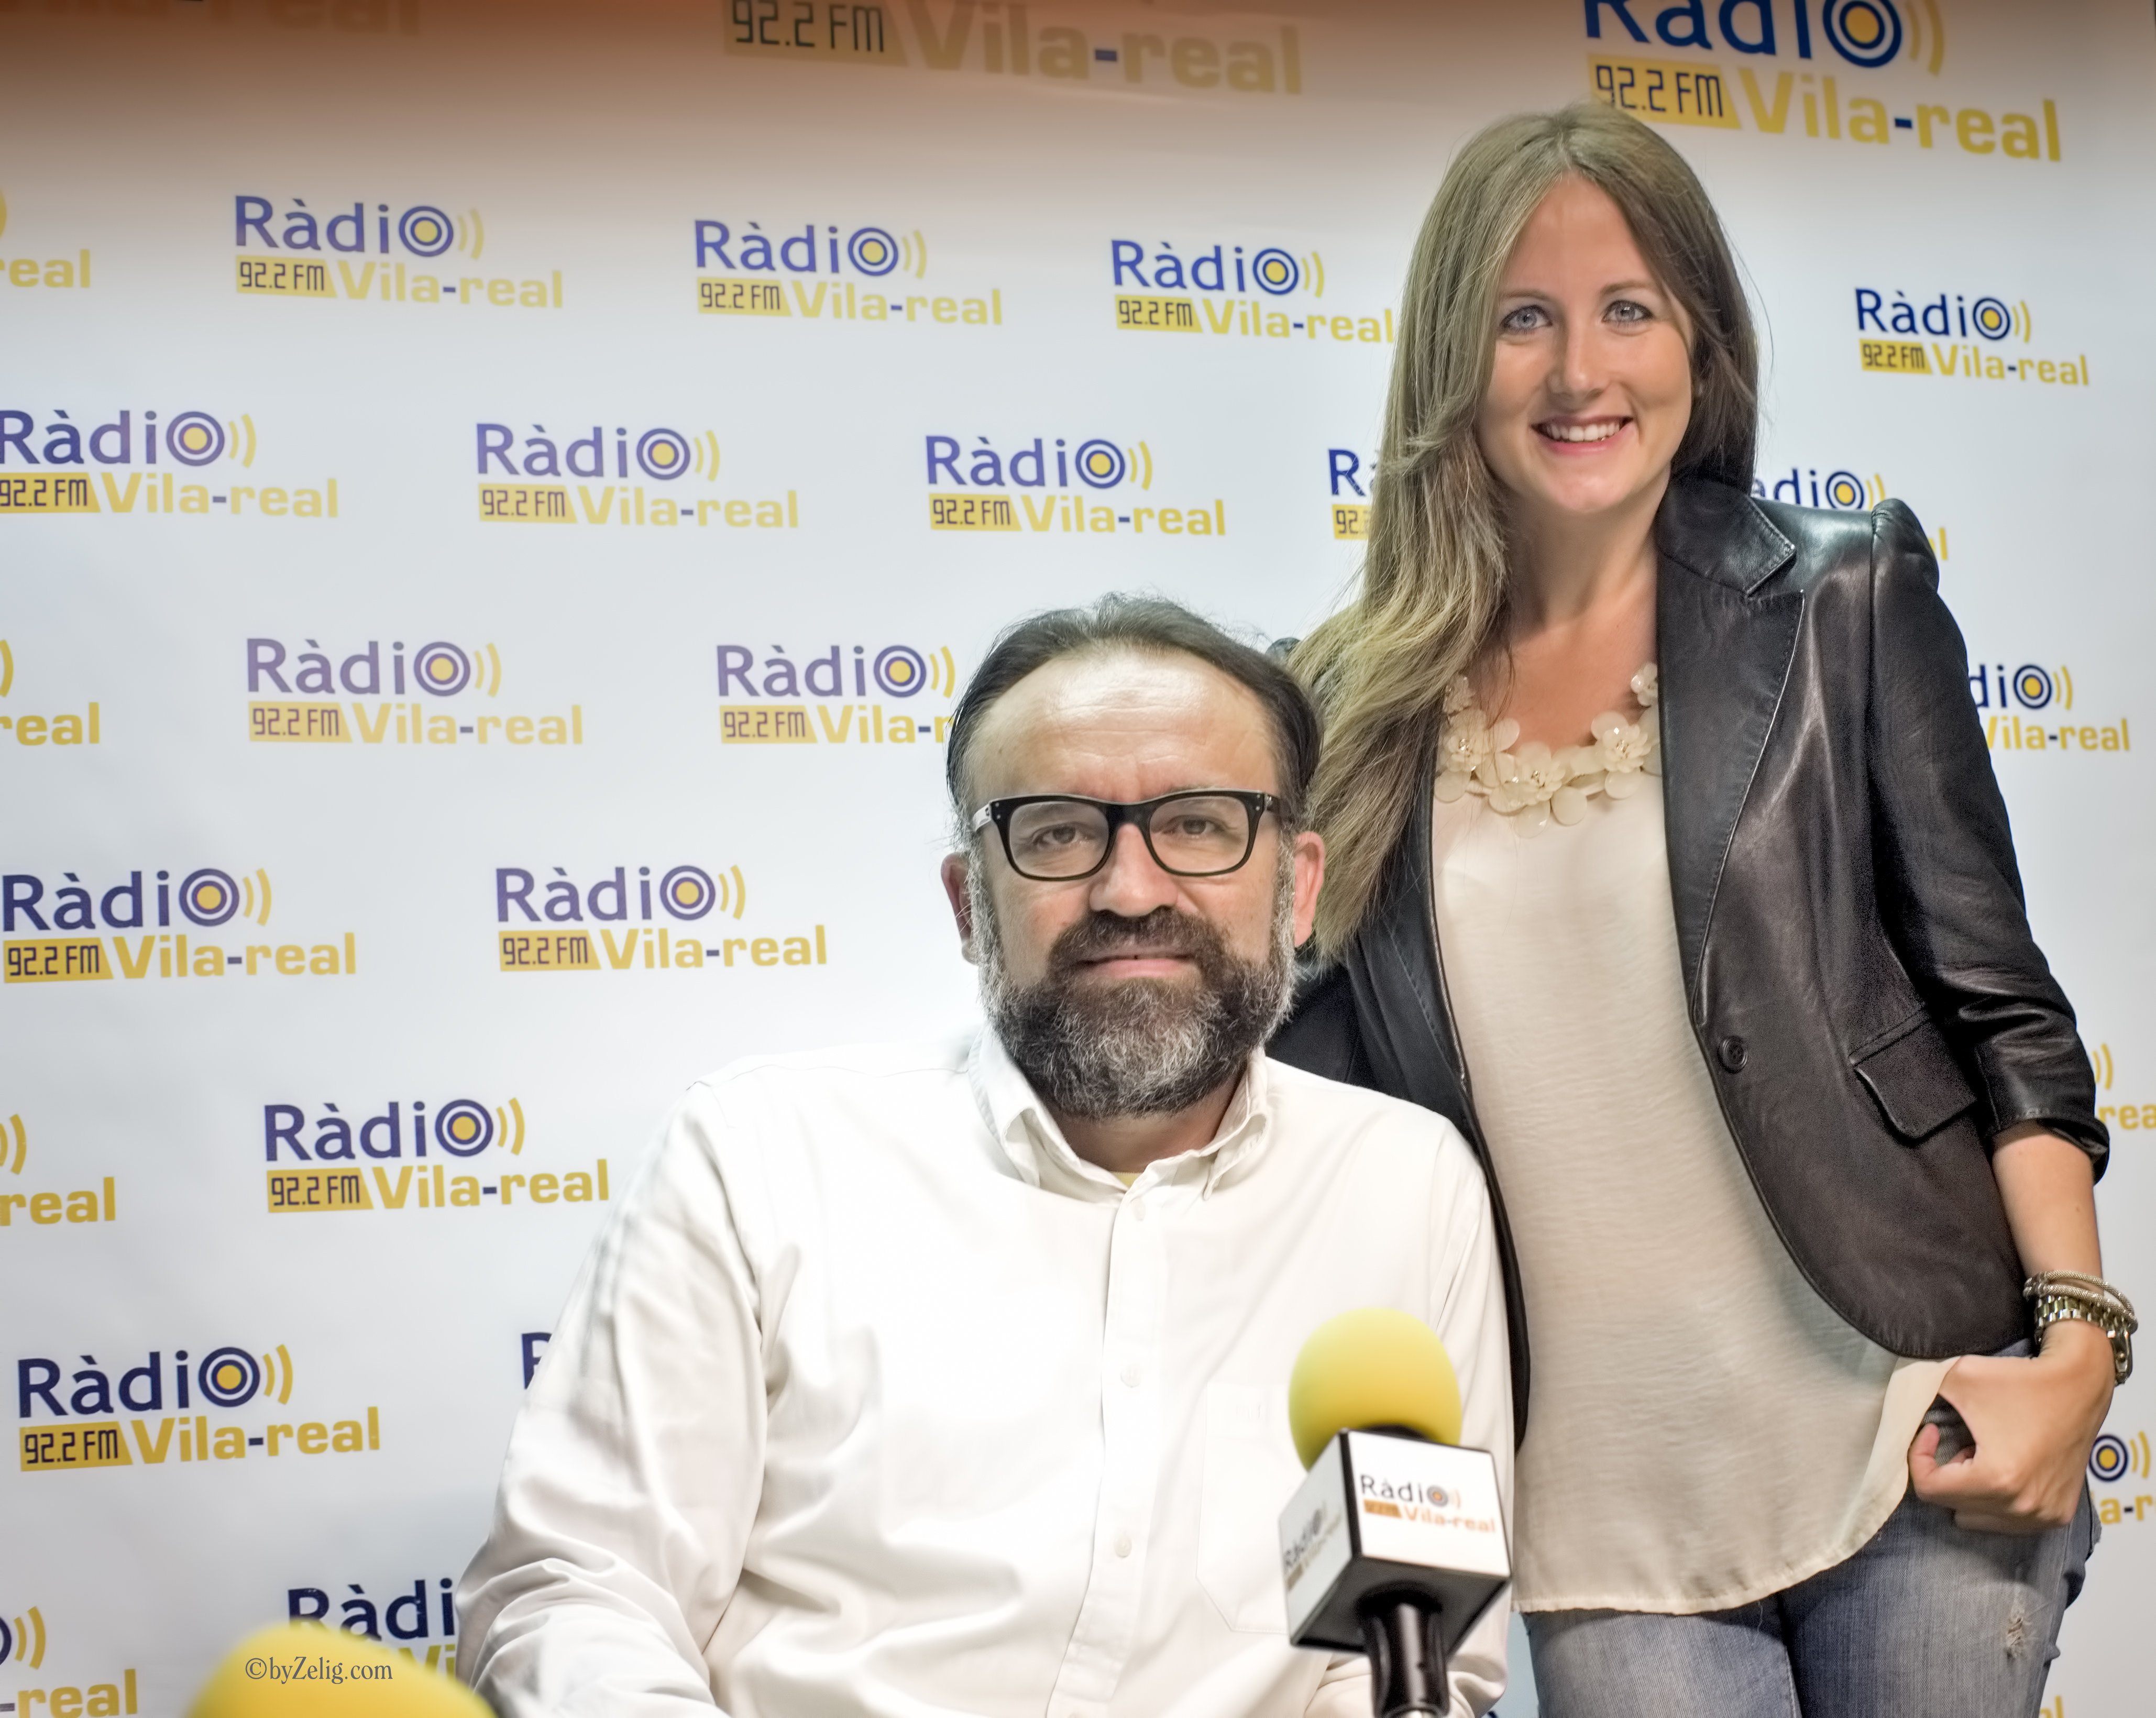 Esports Radio Vila-real. Programa del 13 de diciembre 2017